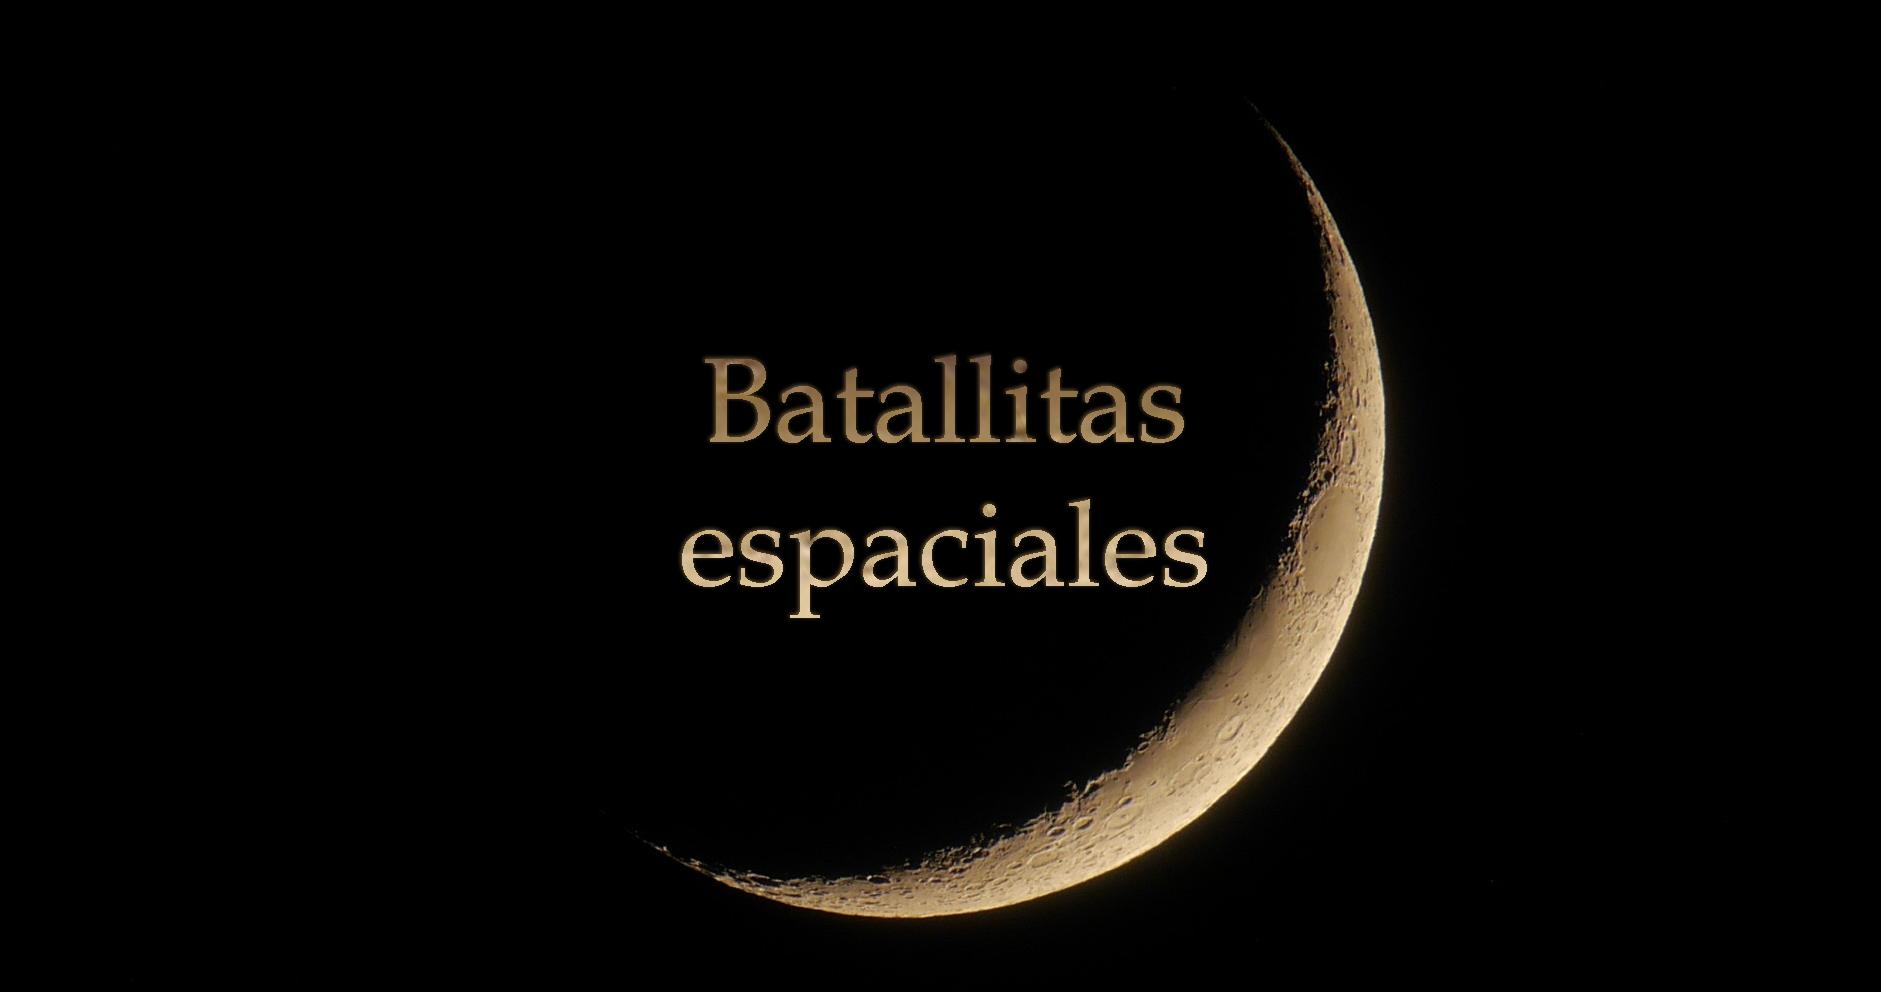 Batallitas espaciales